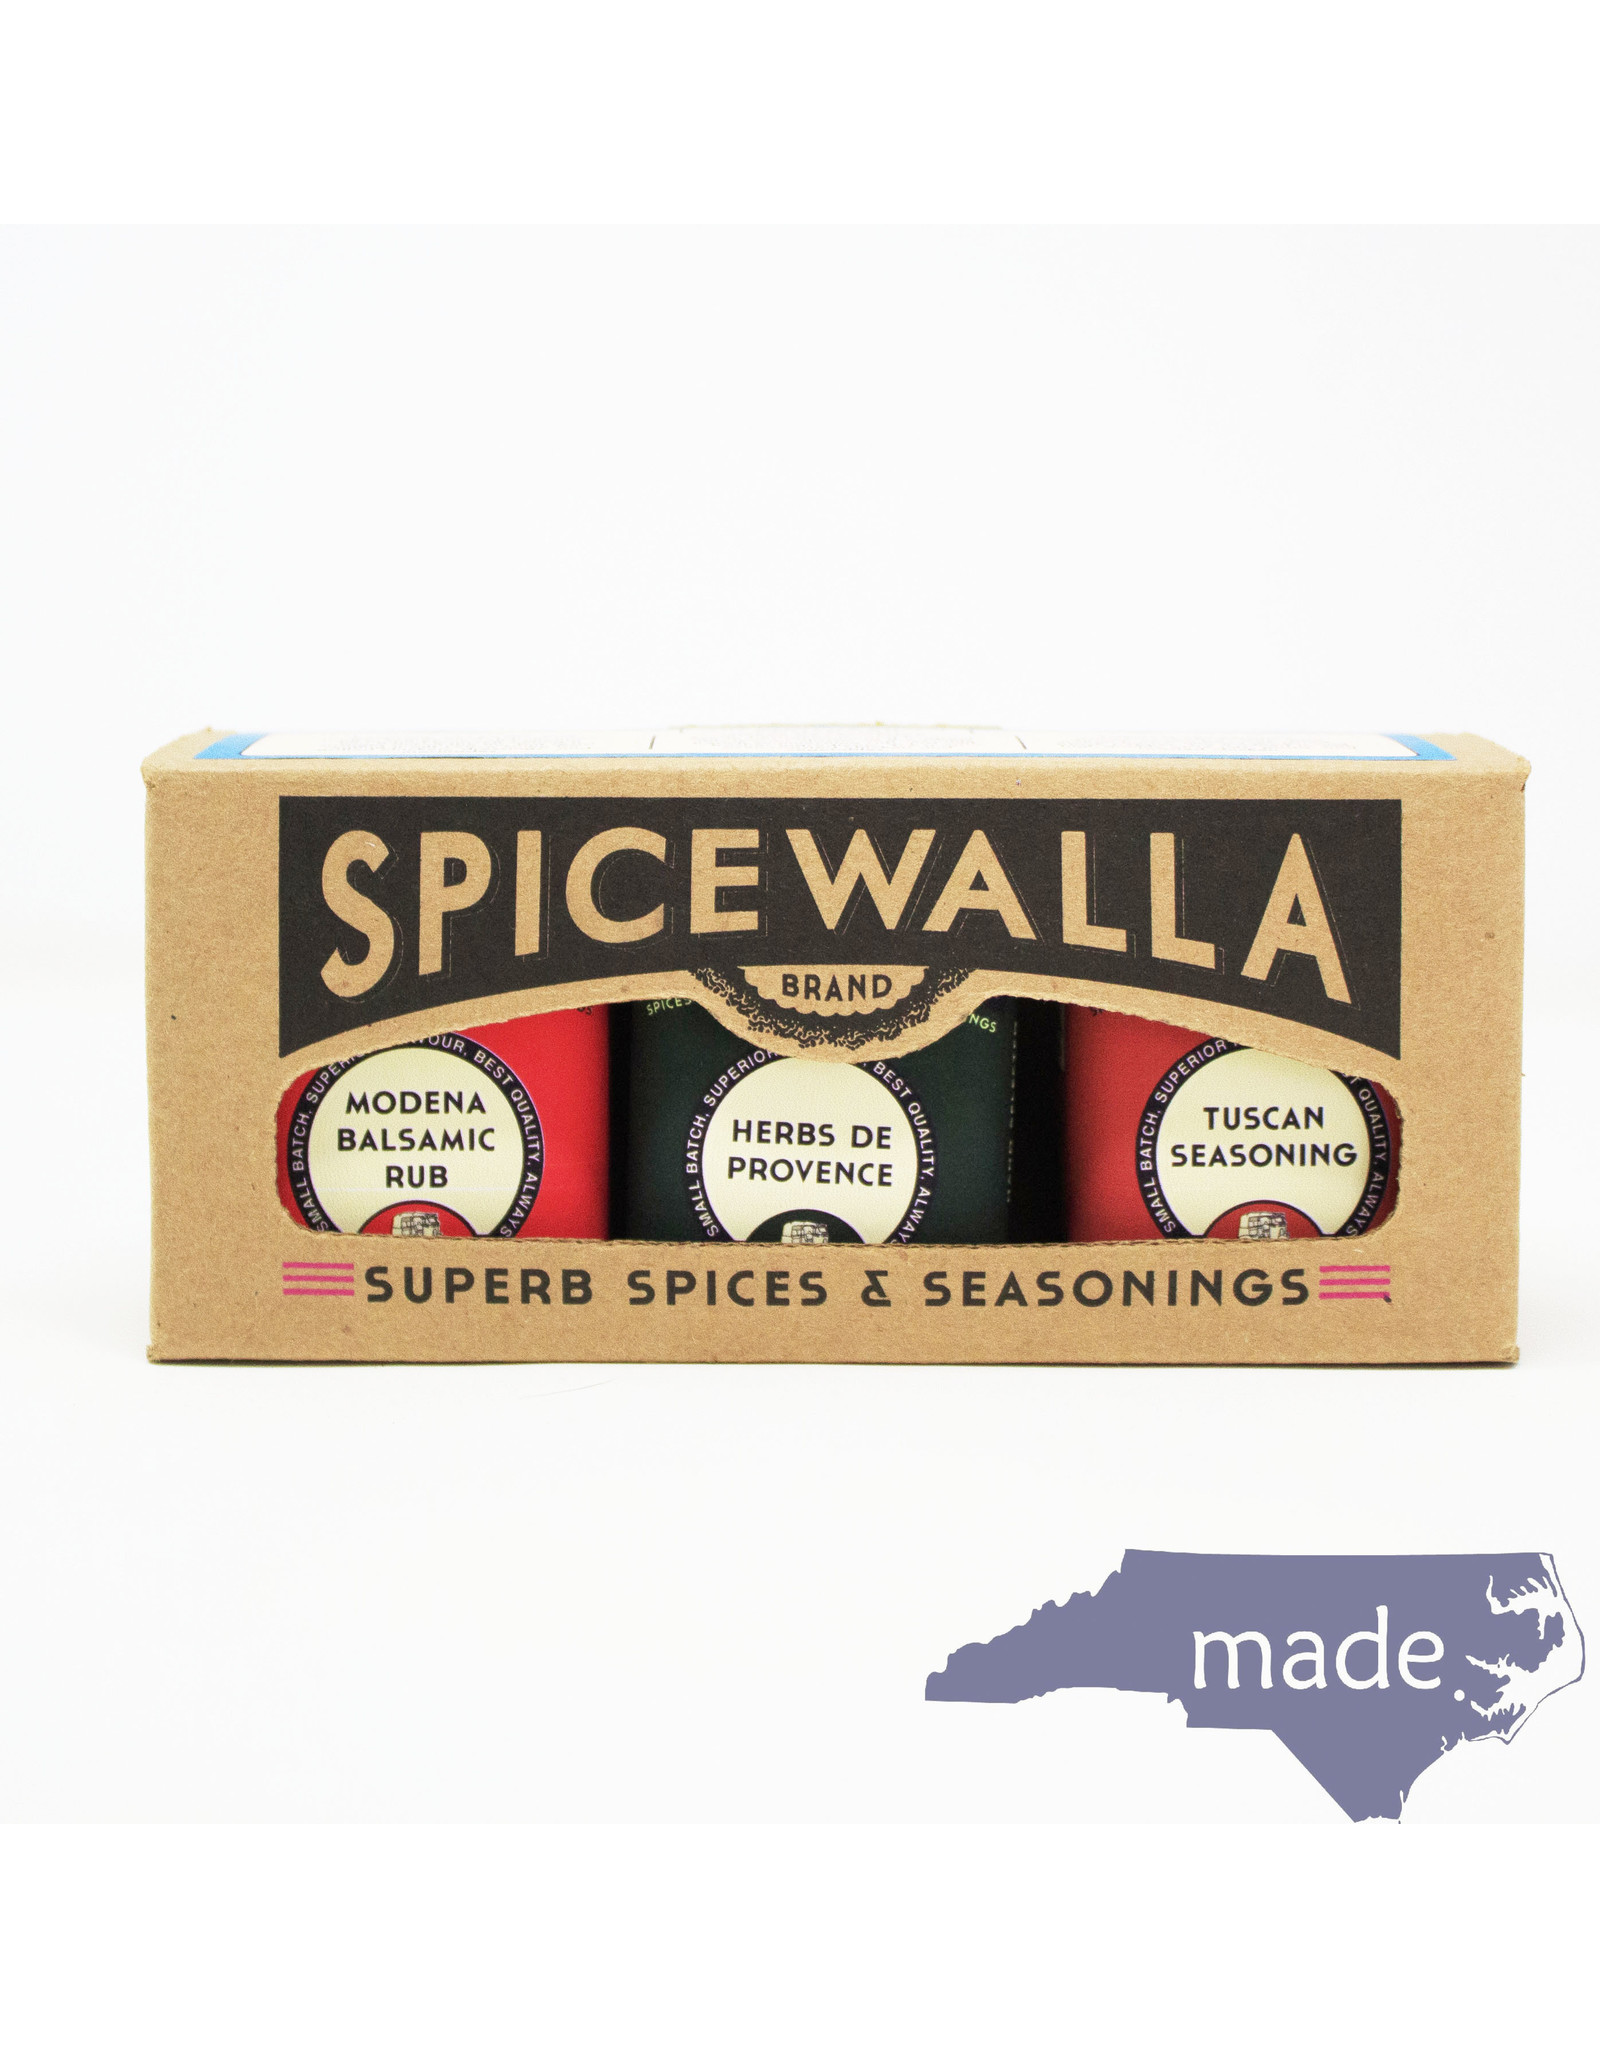 Spicewalla 3 Pack Mediterranean Collection - Spicewalla